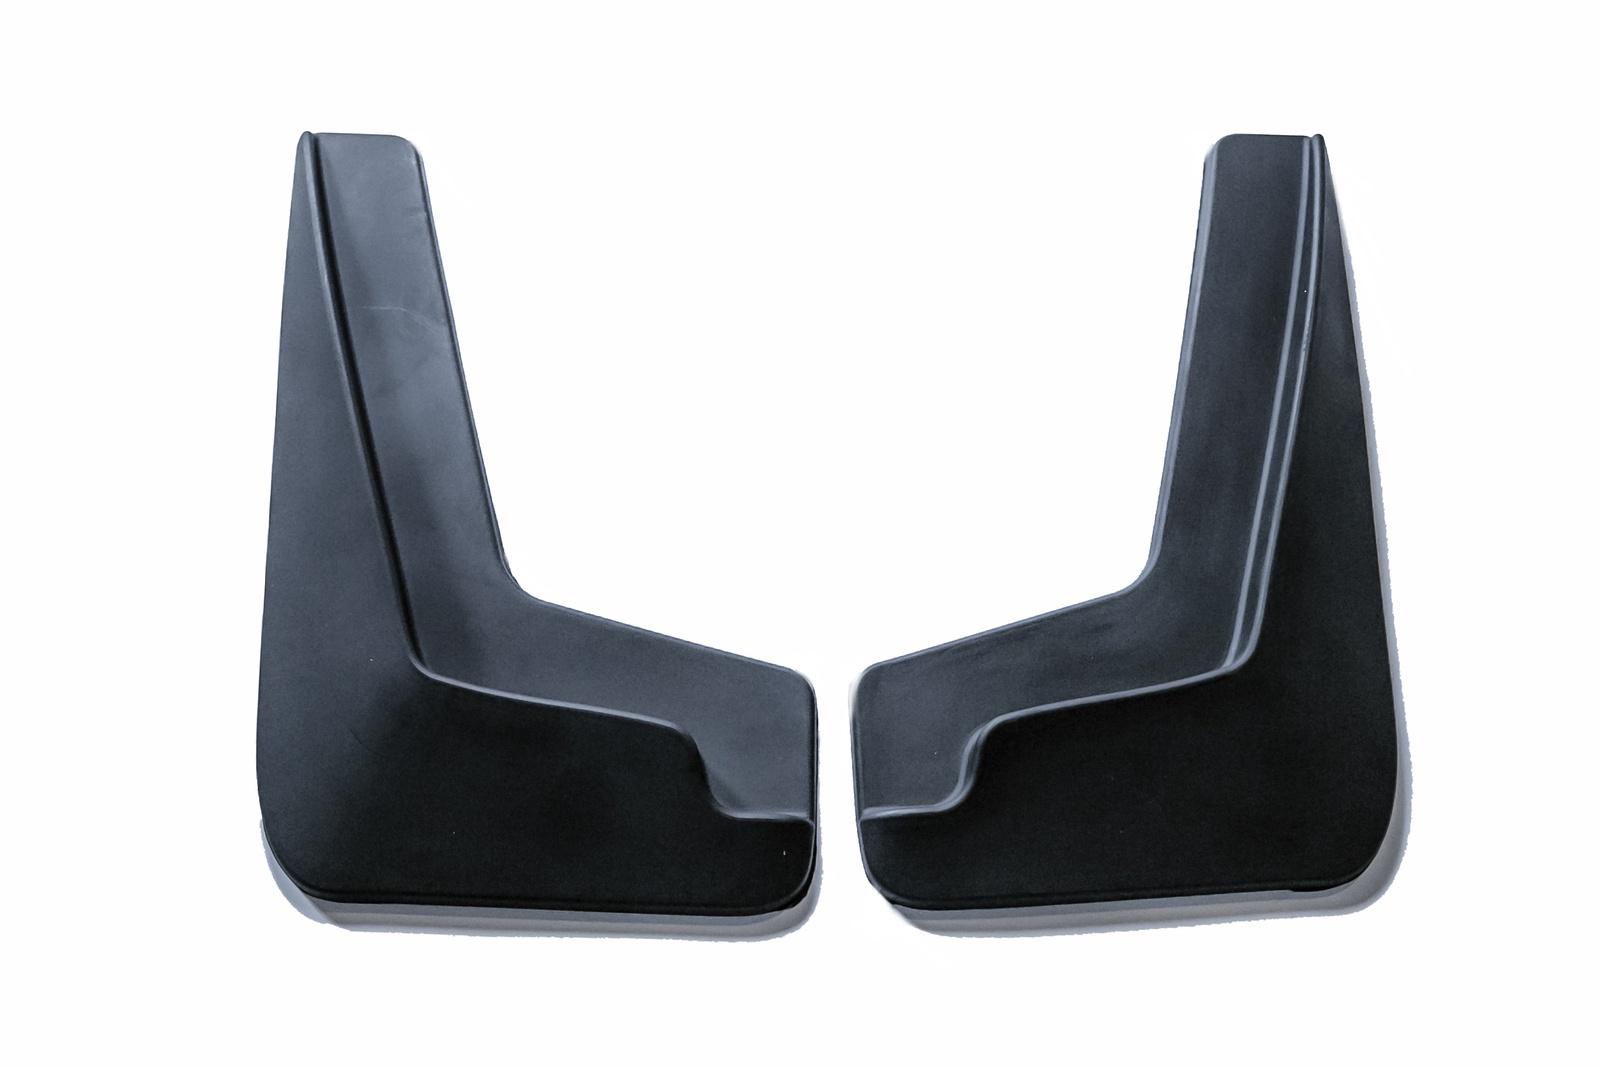 цена на Брызговики резиновые для Toyota Corolla (2013-) Передние